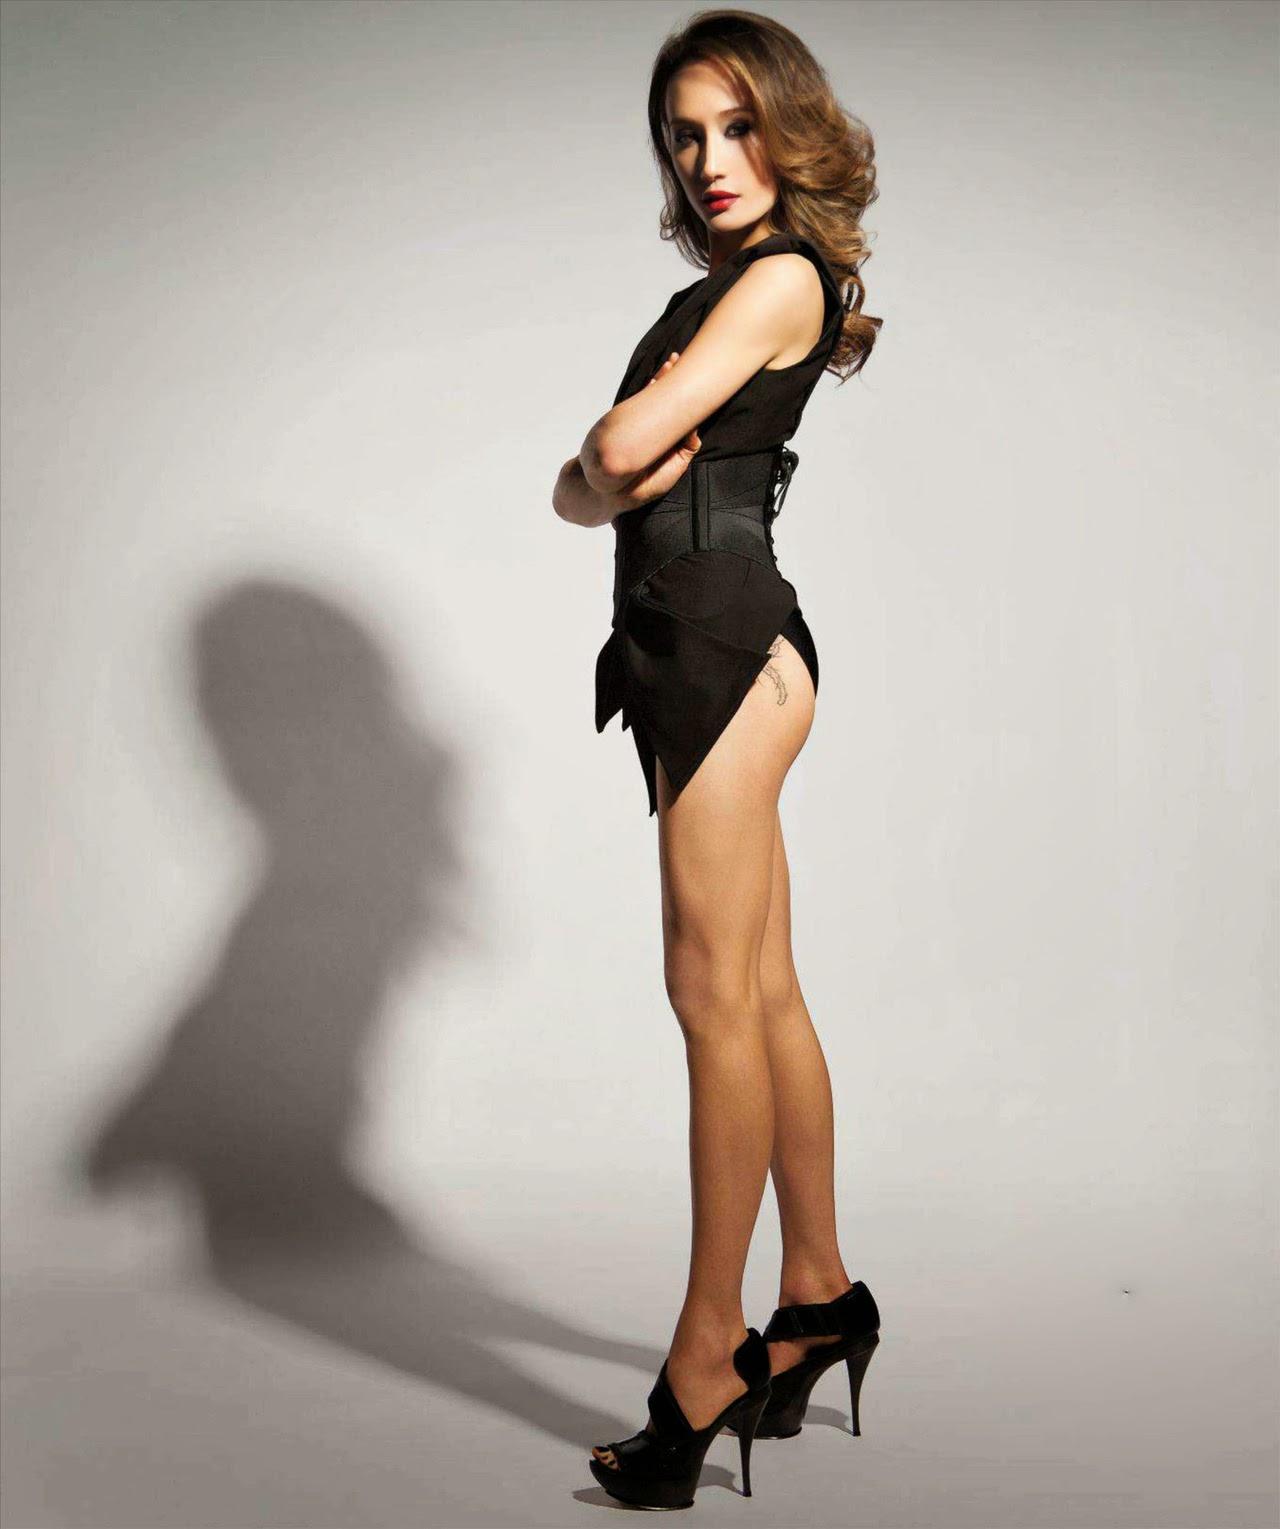 Maggie Q sexy skinny legs in heels